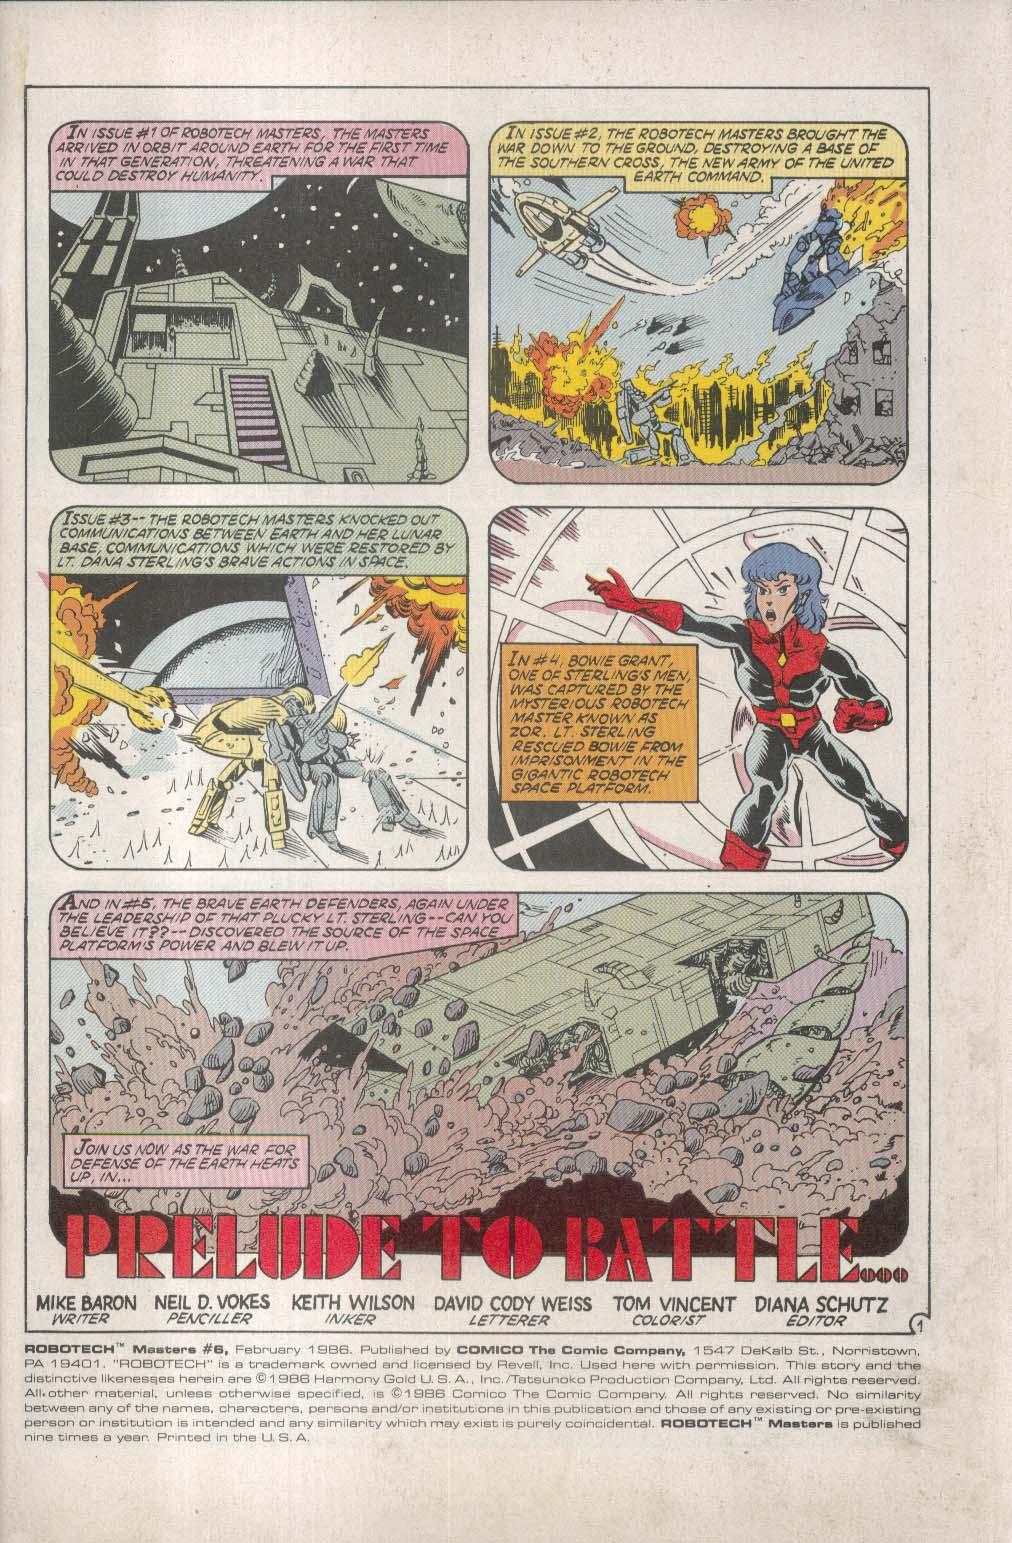 ROBOTECH Masters #6 Comico comic book 2 1986